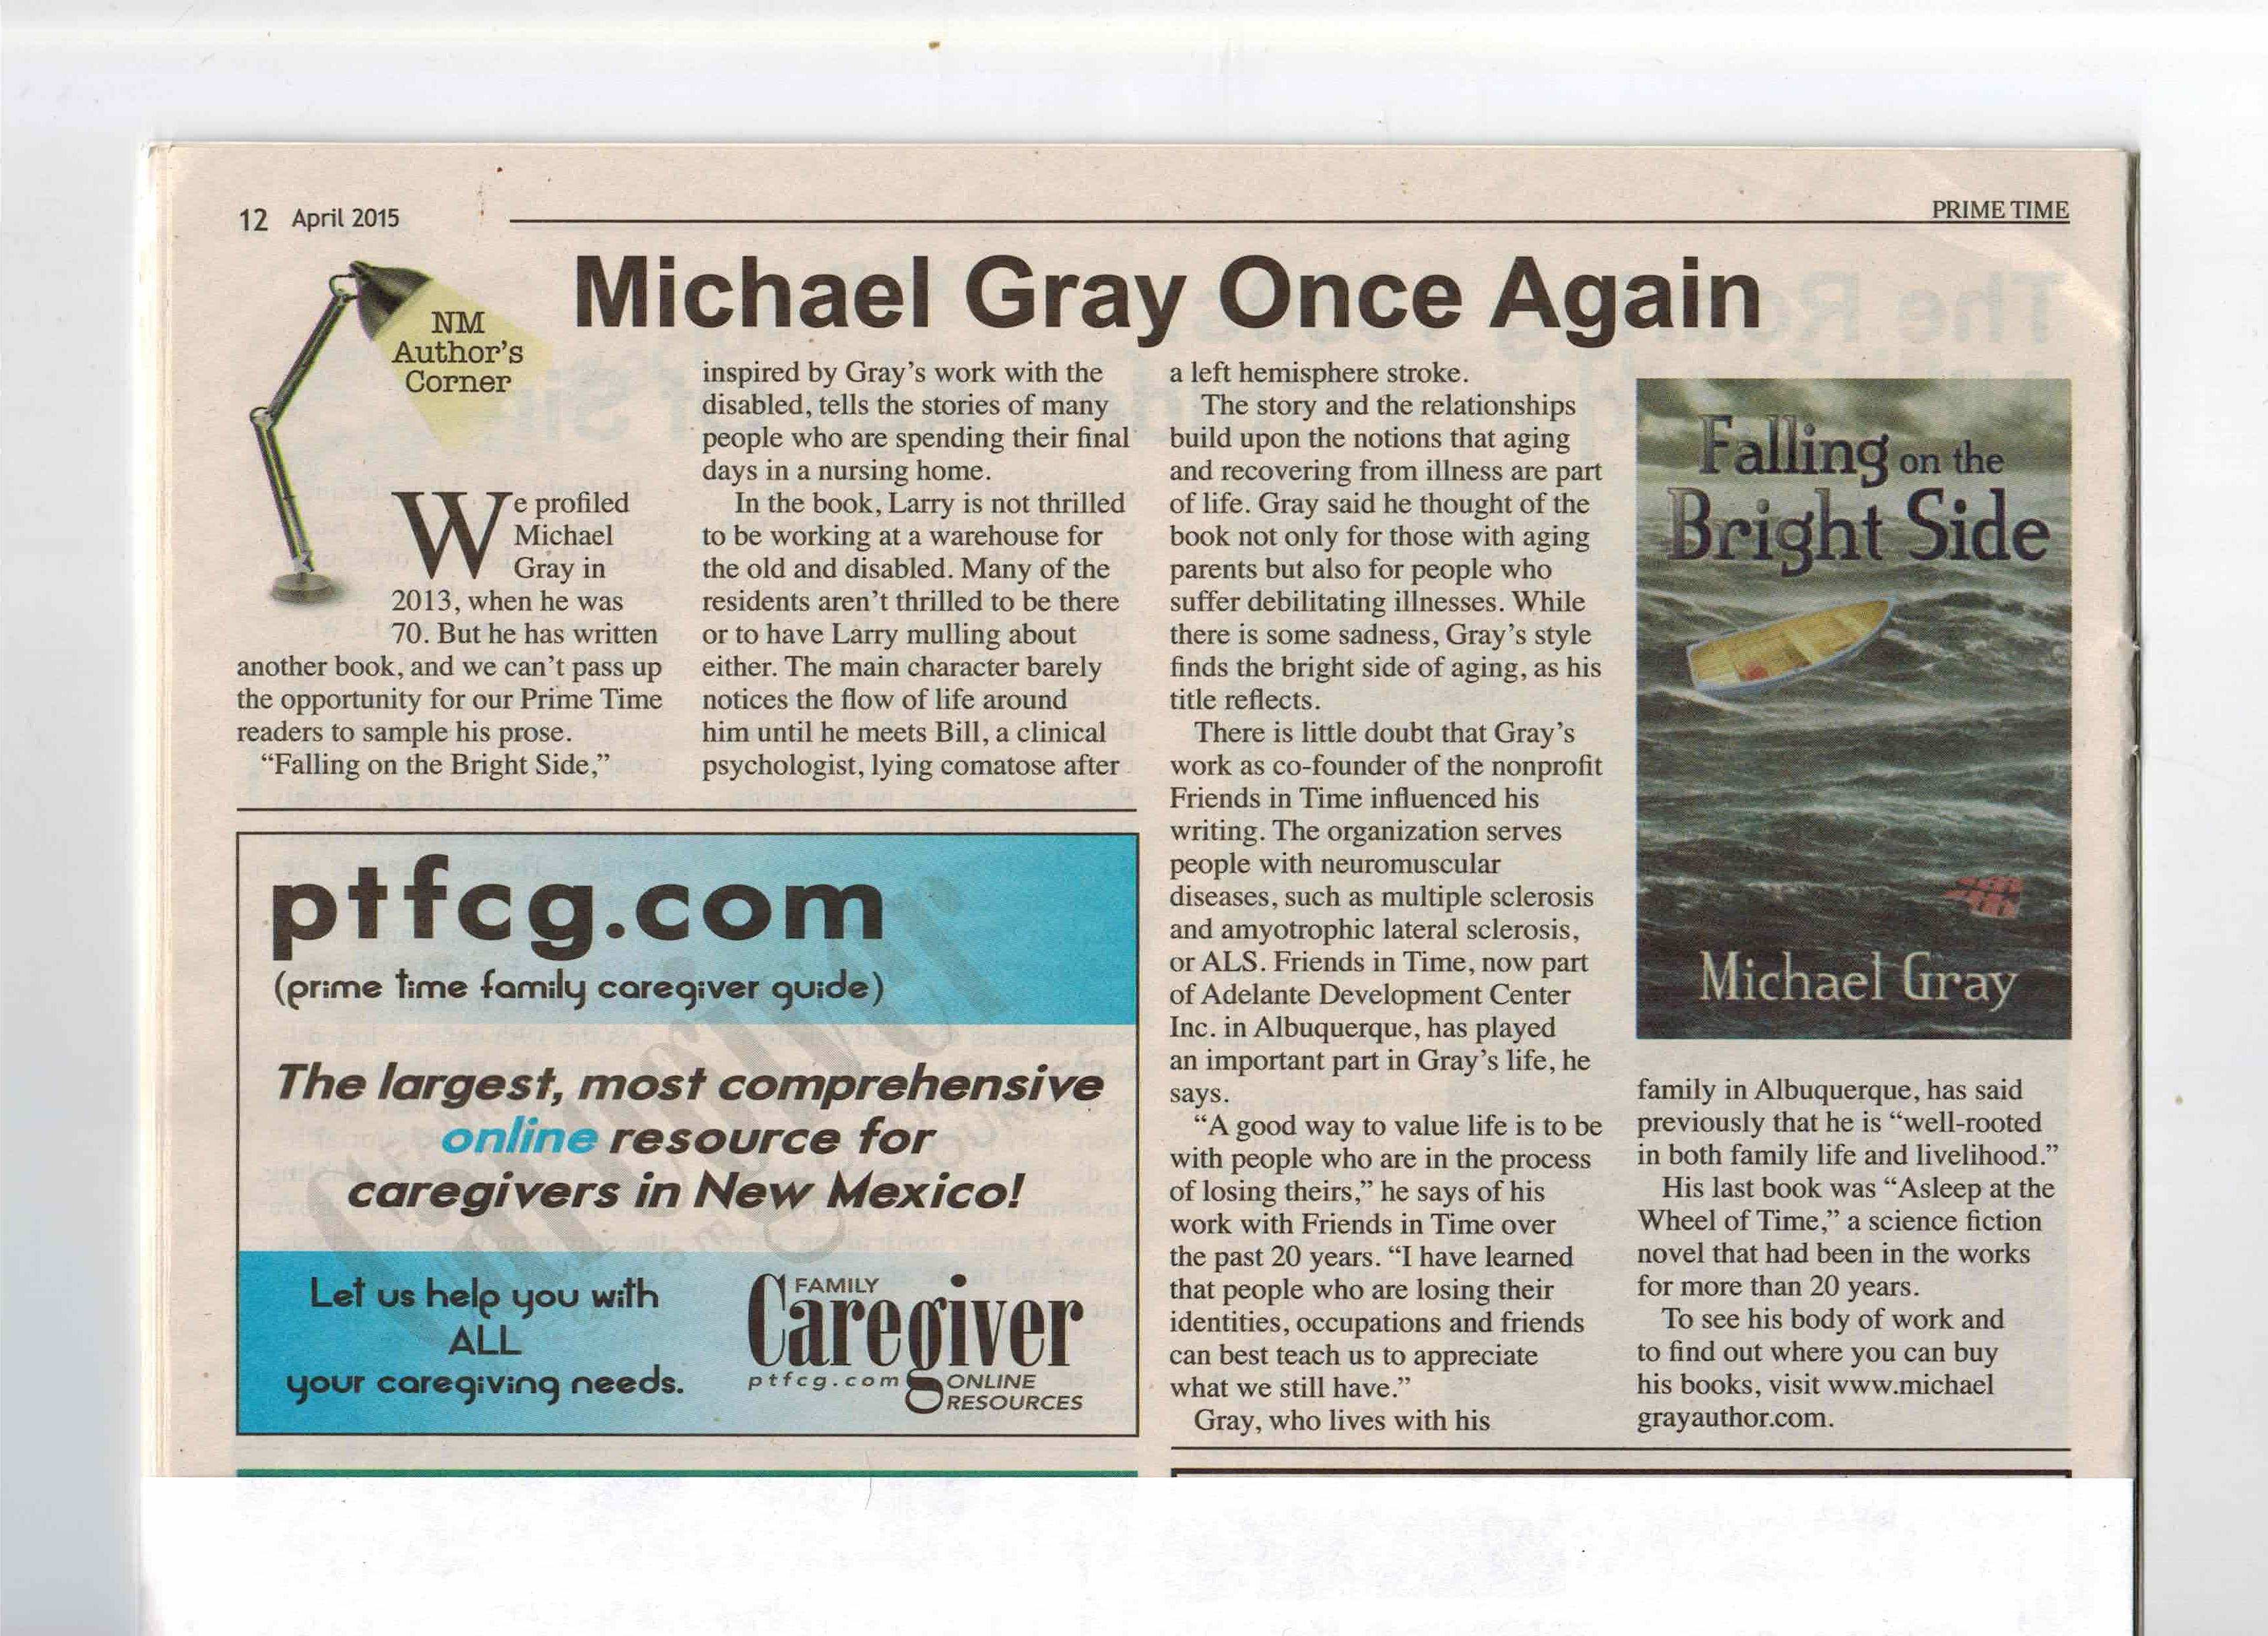 PrimeTime, April 2015 - Michael Gray Once Again